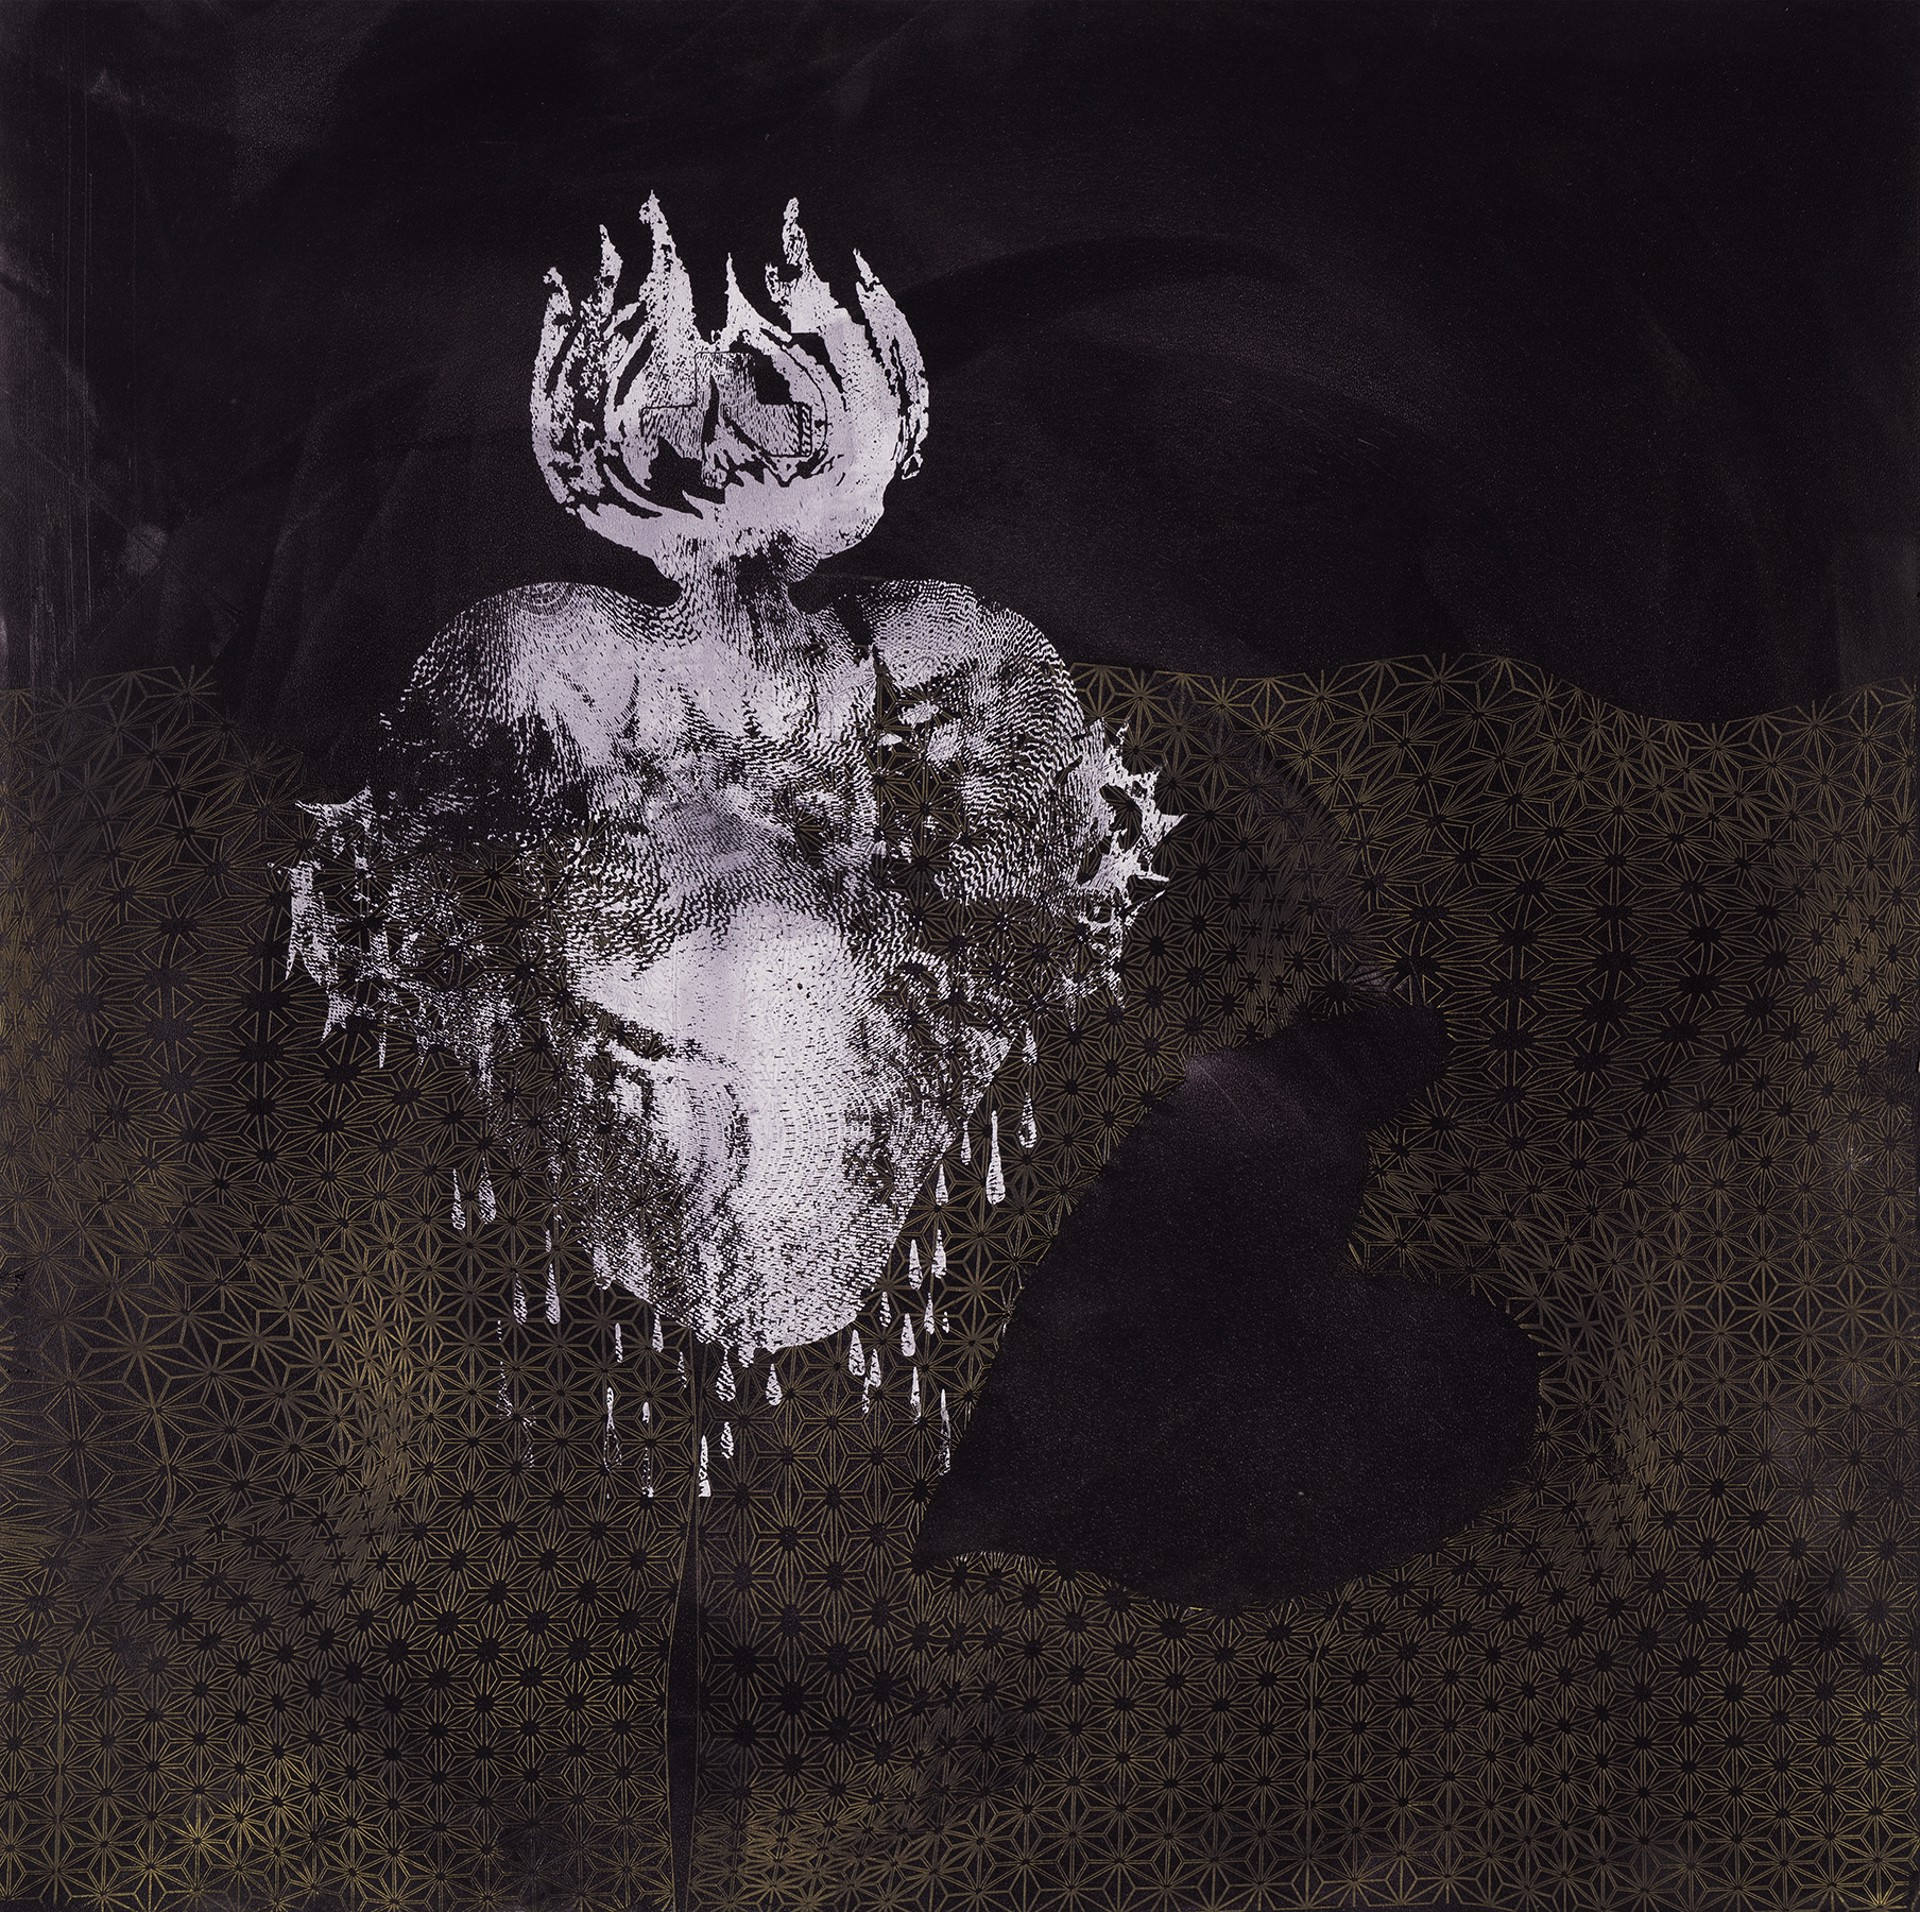 Soulless by Dorothea Van Camp